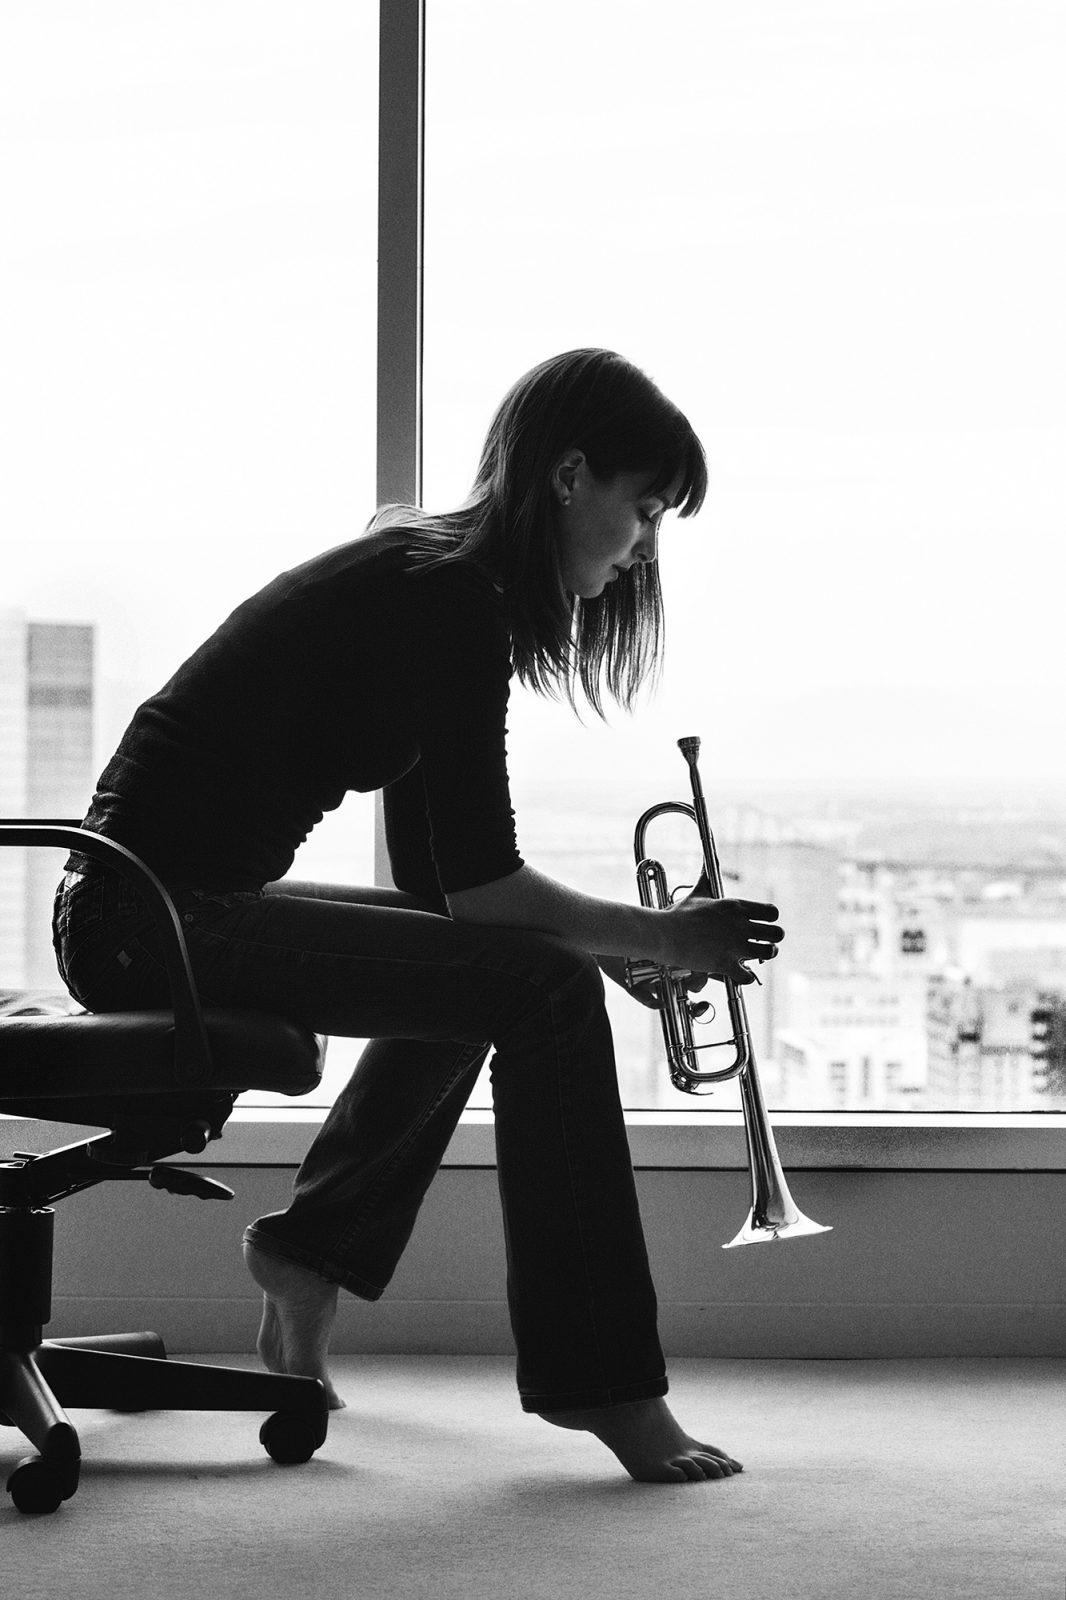 creative editorial photography, musician portrait, Sarah Raid